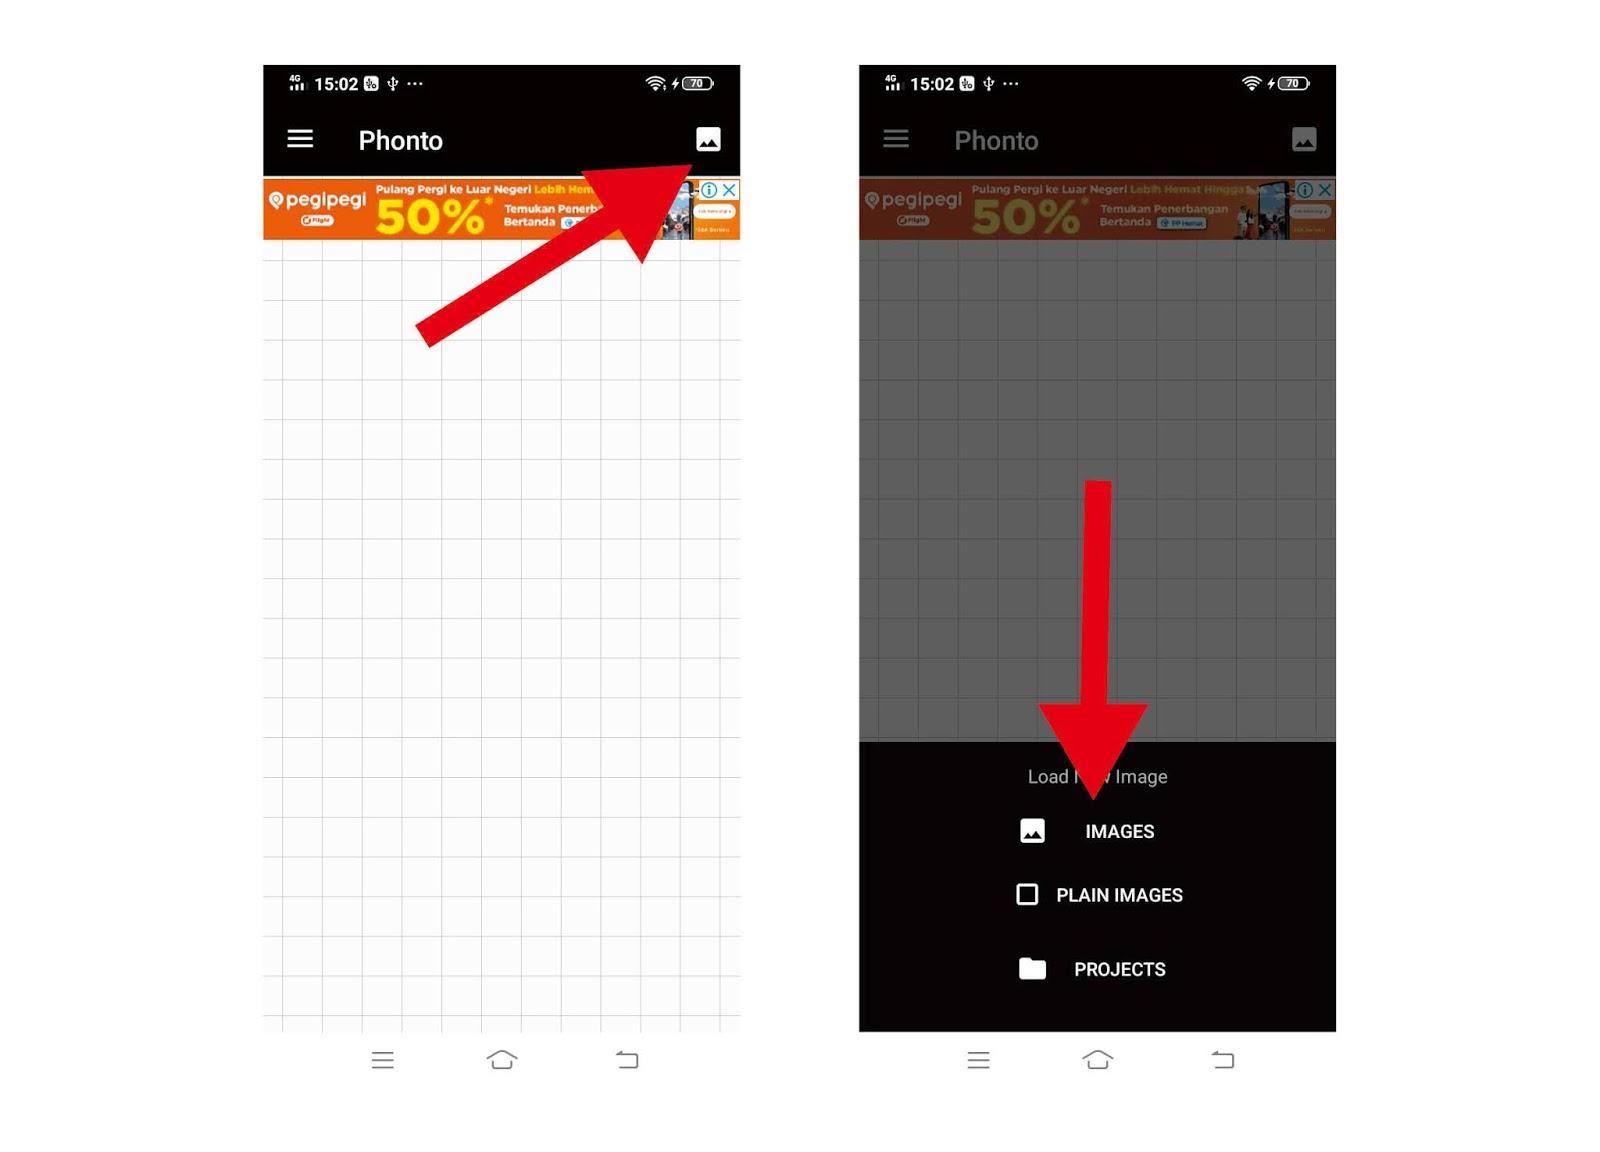 Cara Menggunakan Aplikasi Phonto